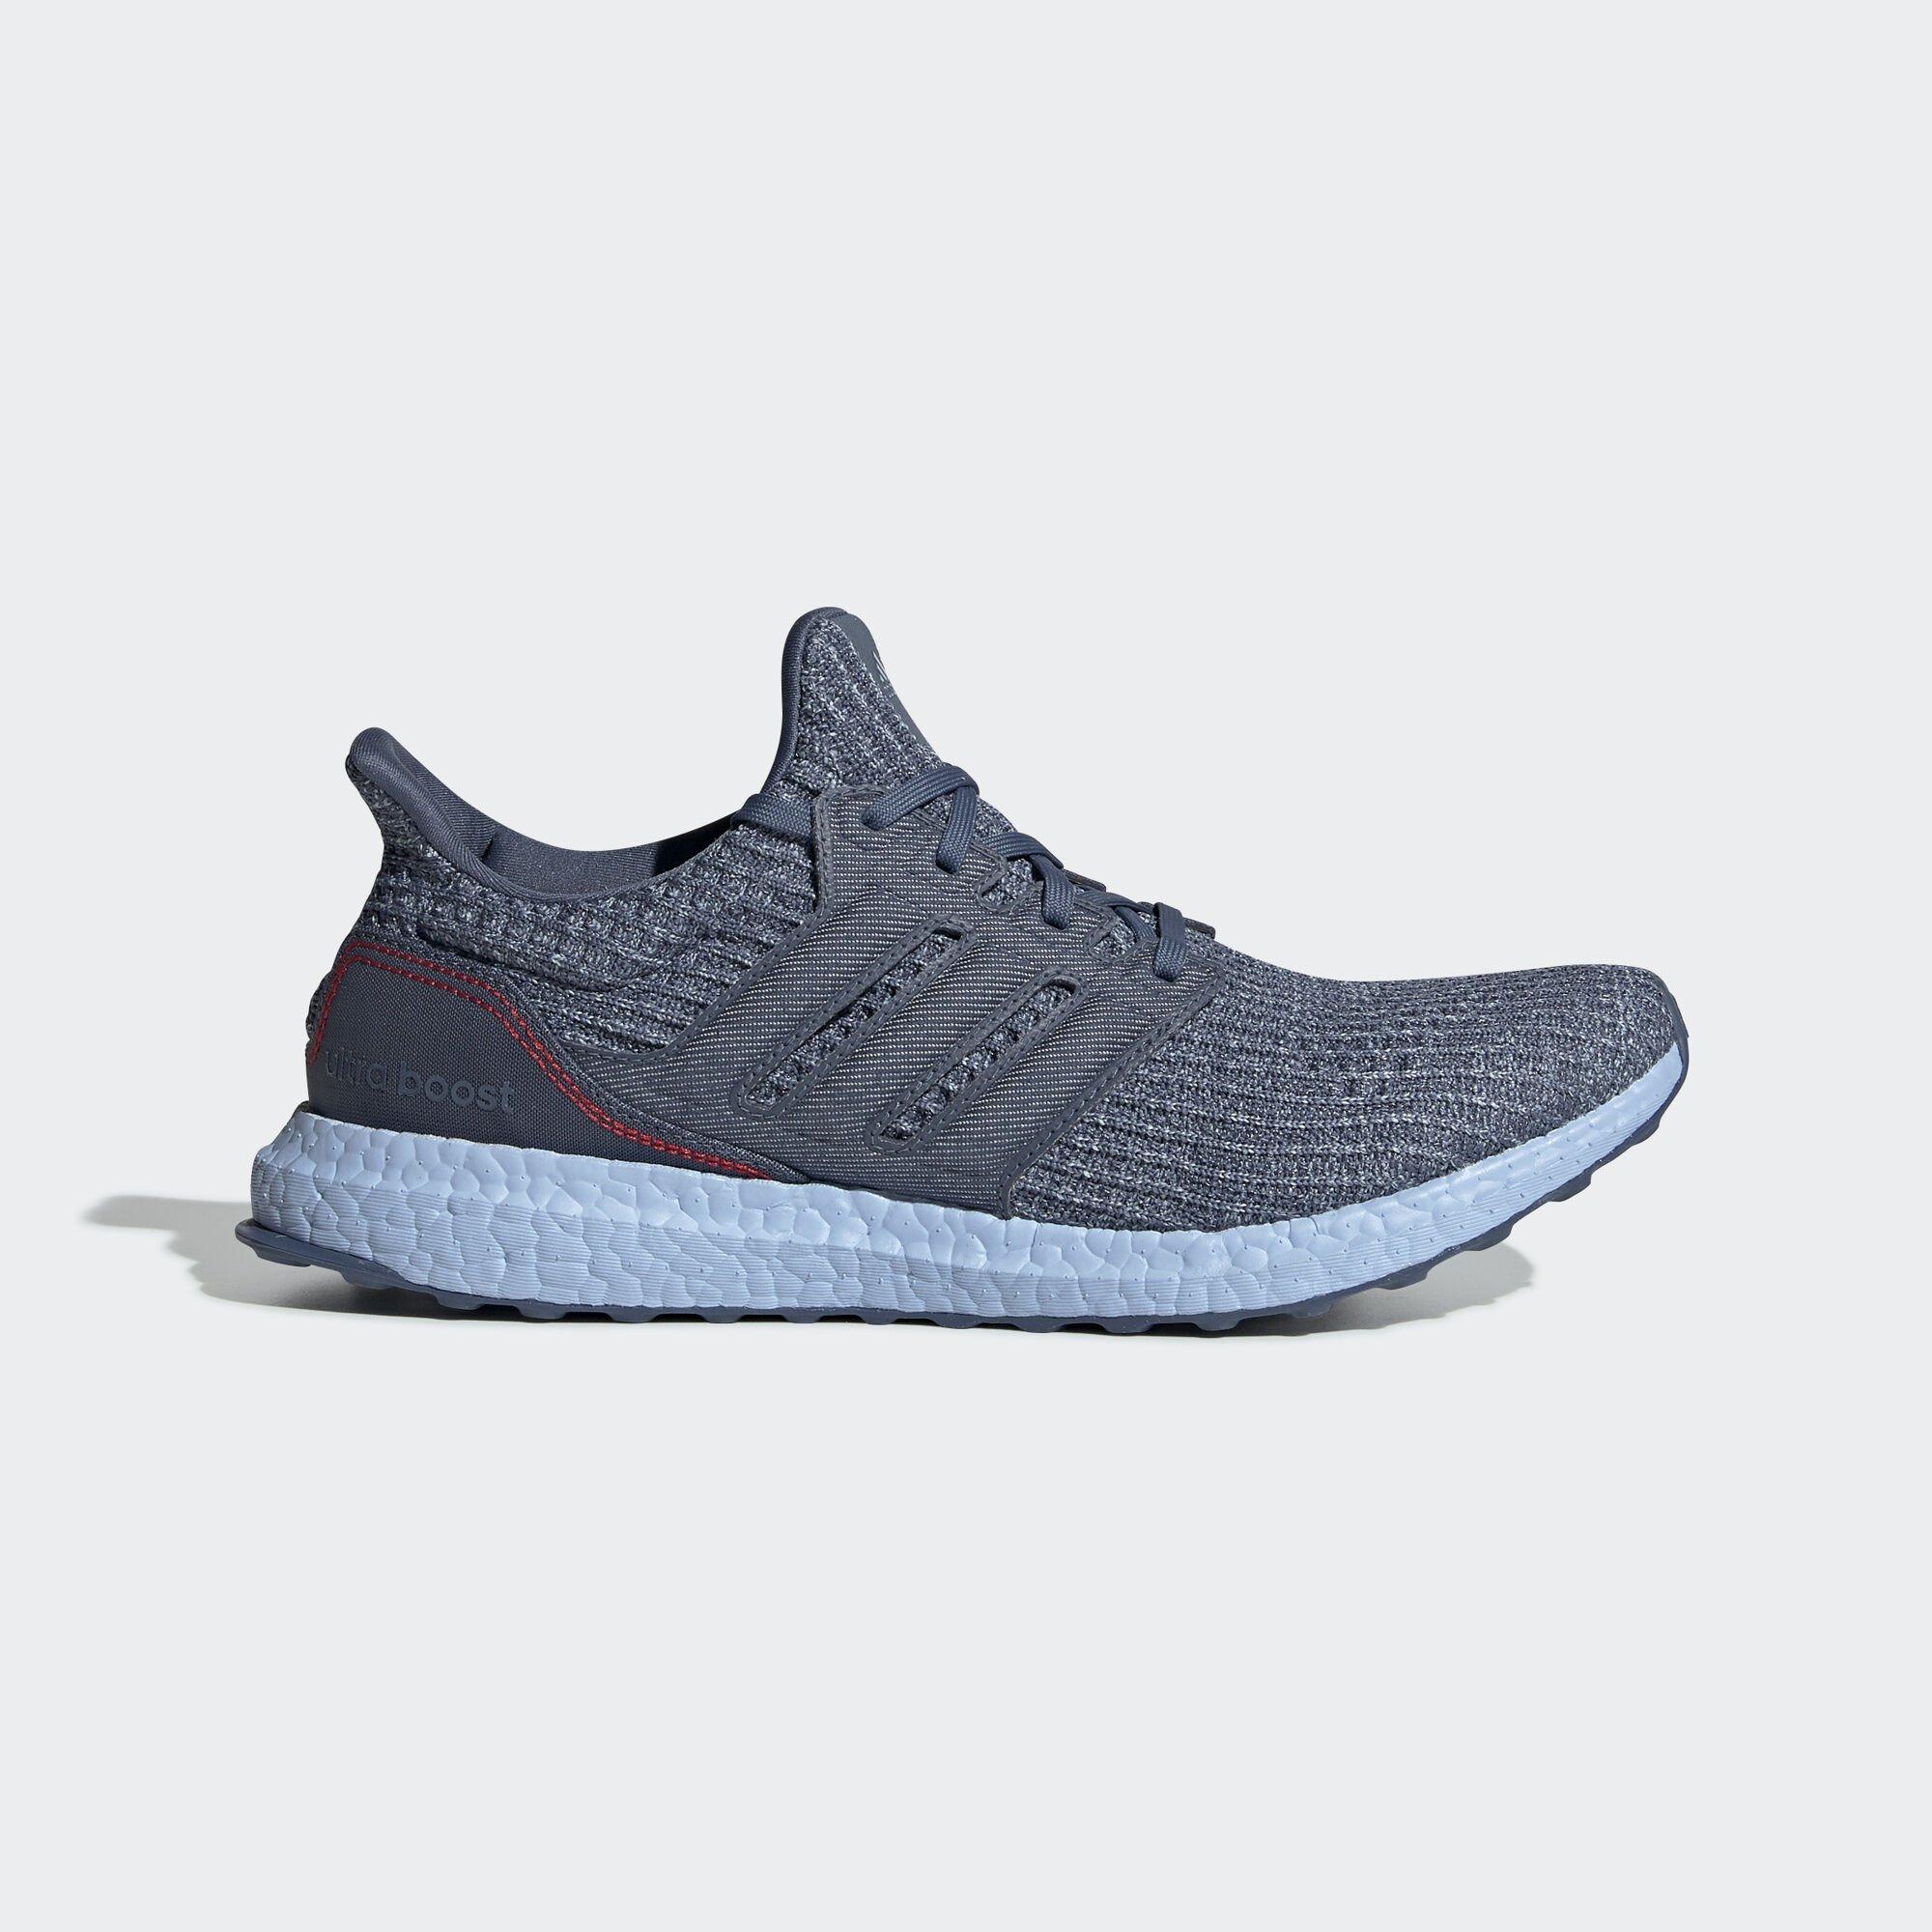 adidas Ultra Boost Tech Ink Glow Blue (G54002)